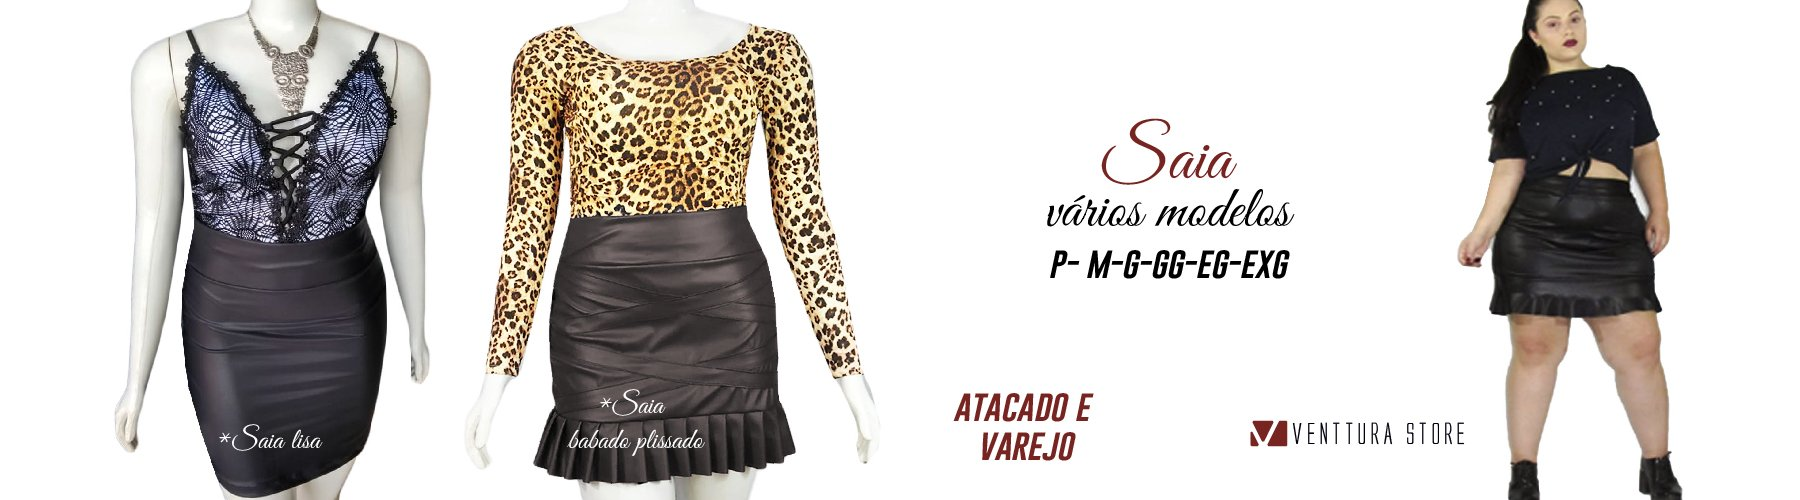 4849acb24db5f2 Venttura Store - moda plus size